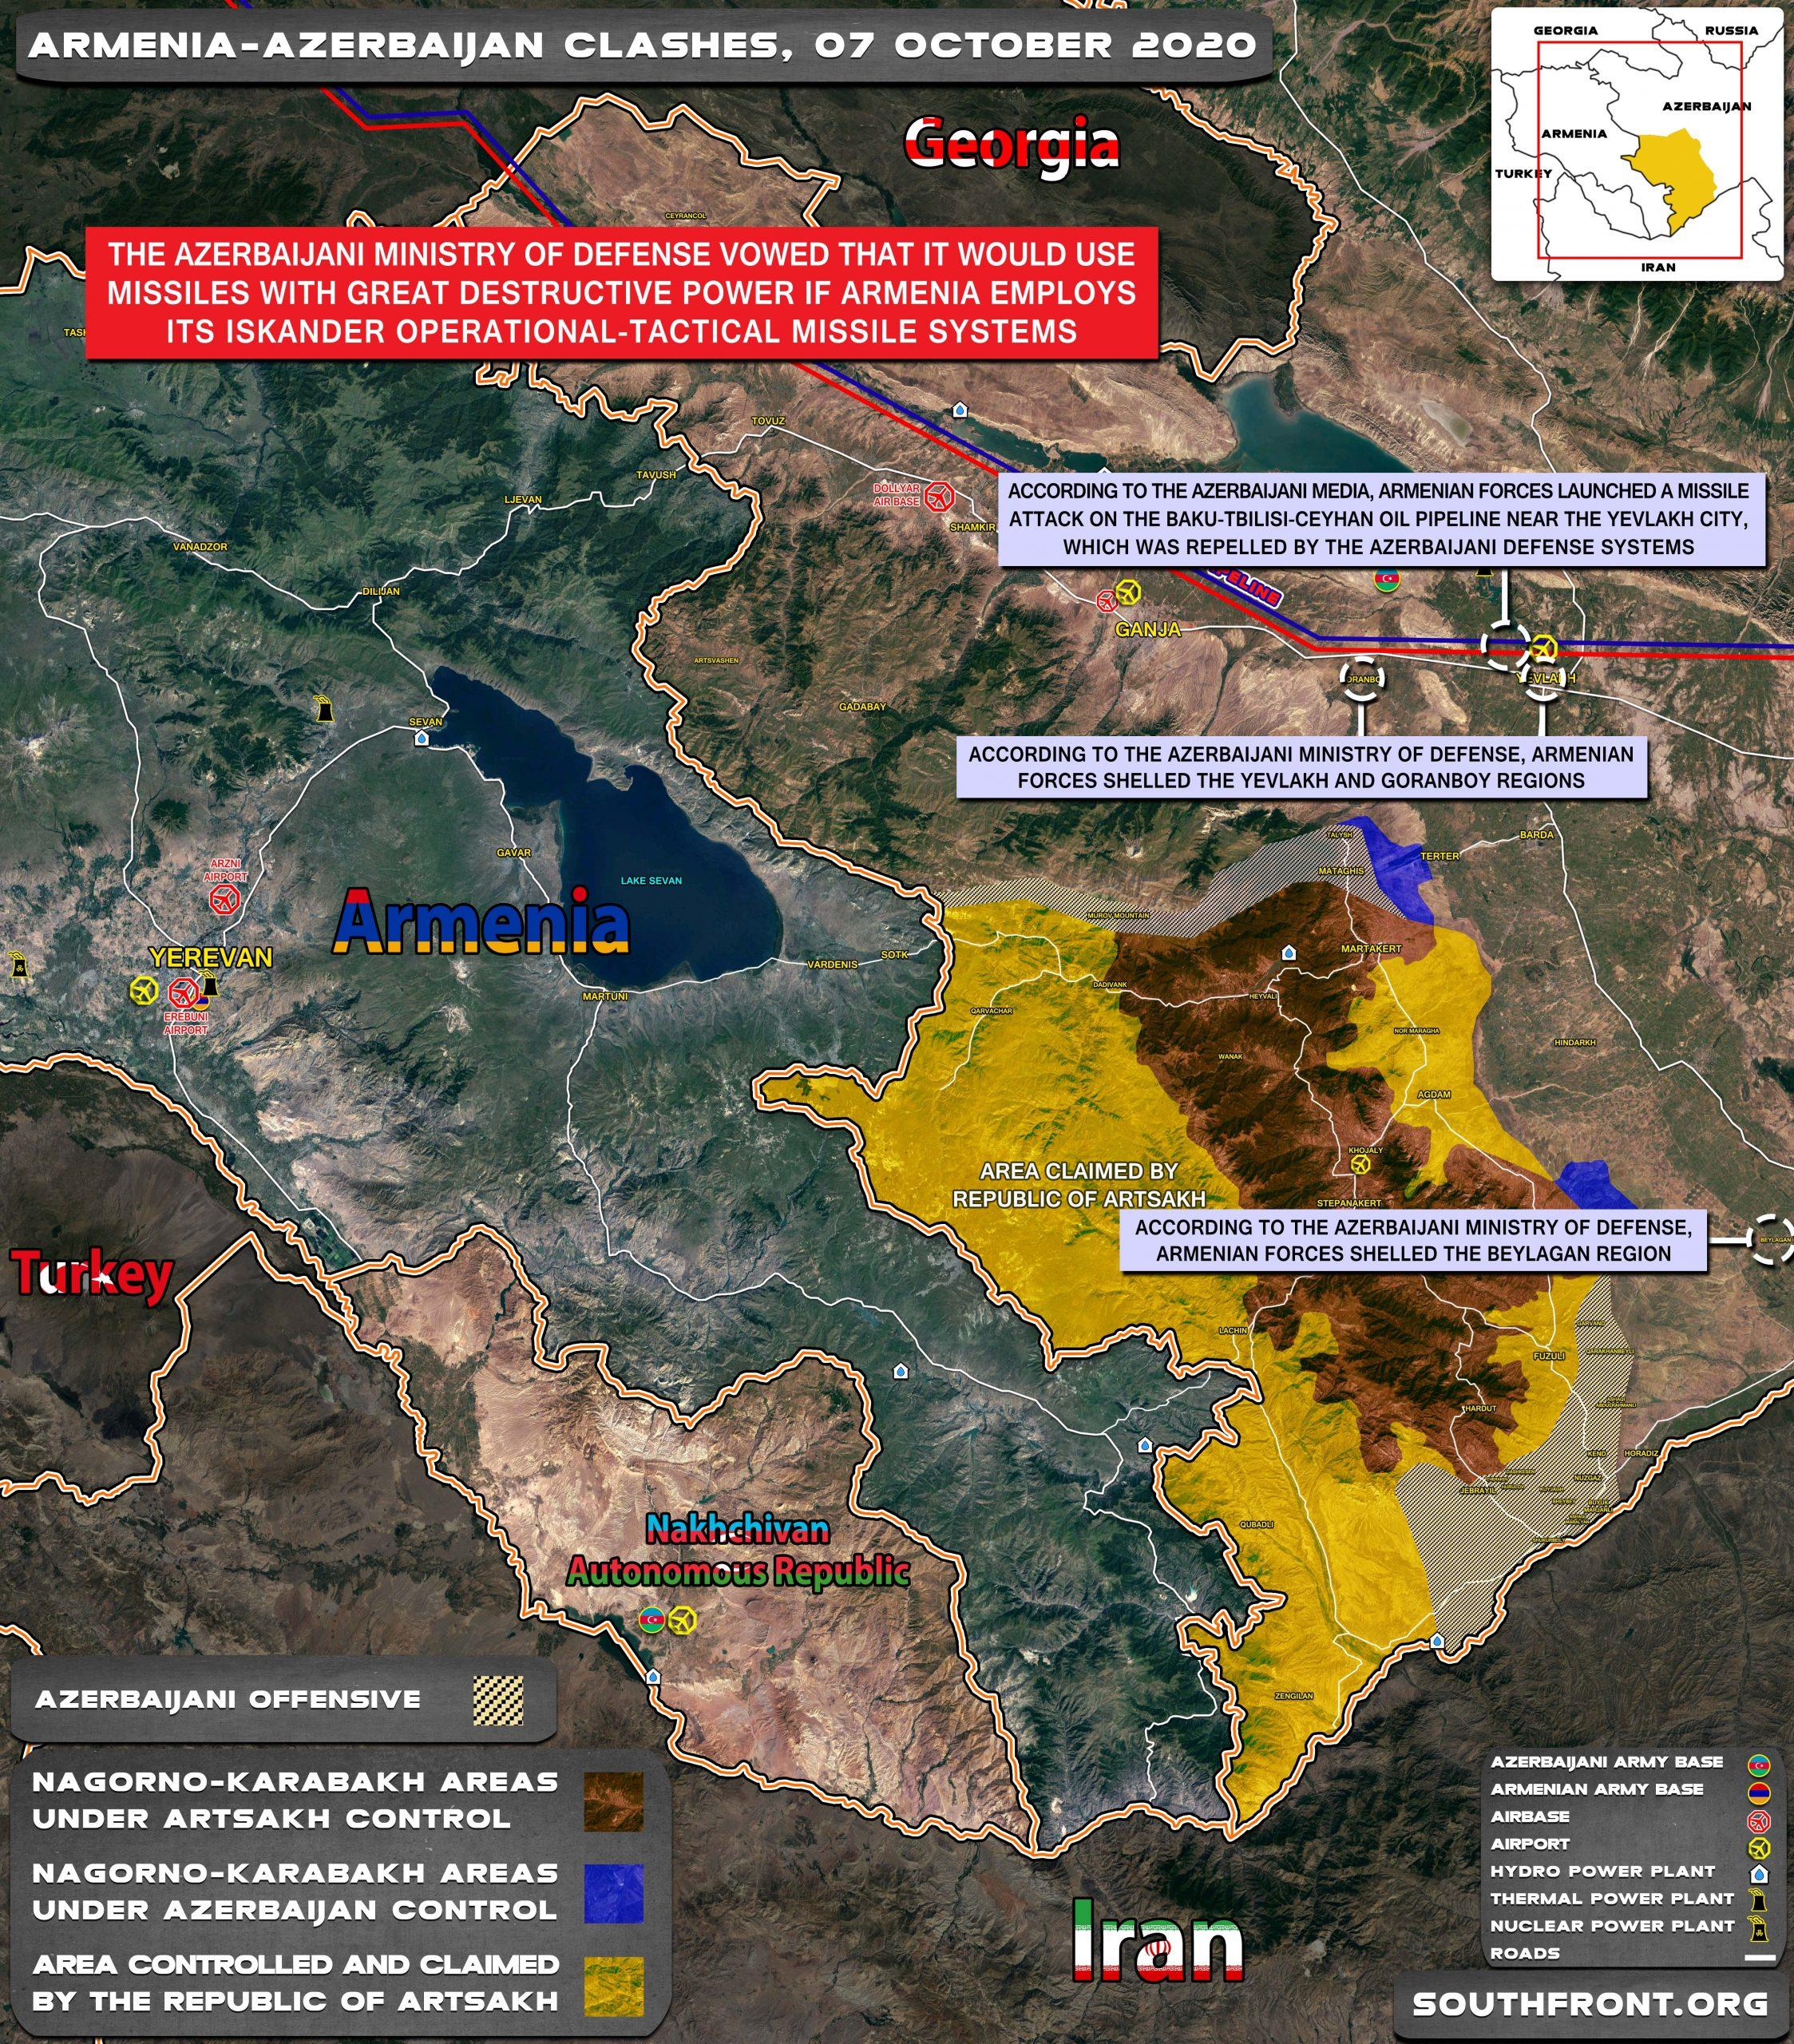 Azerbaijan, Armenia Exchange Exaggerated Losses Claims